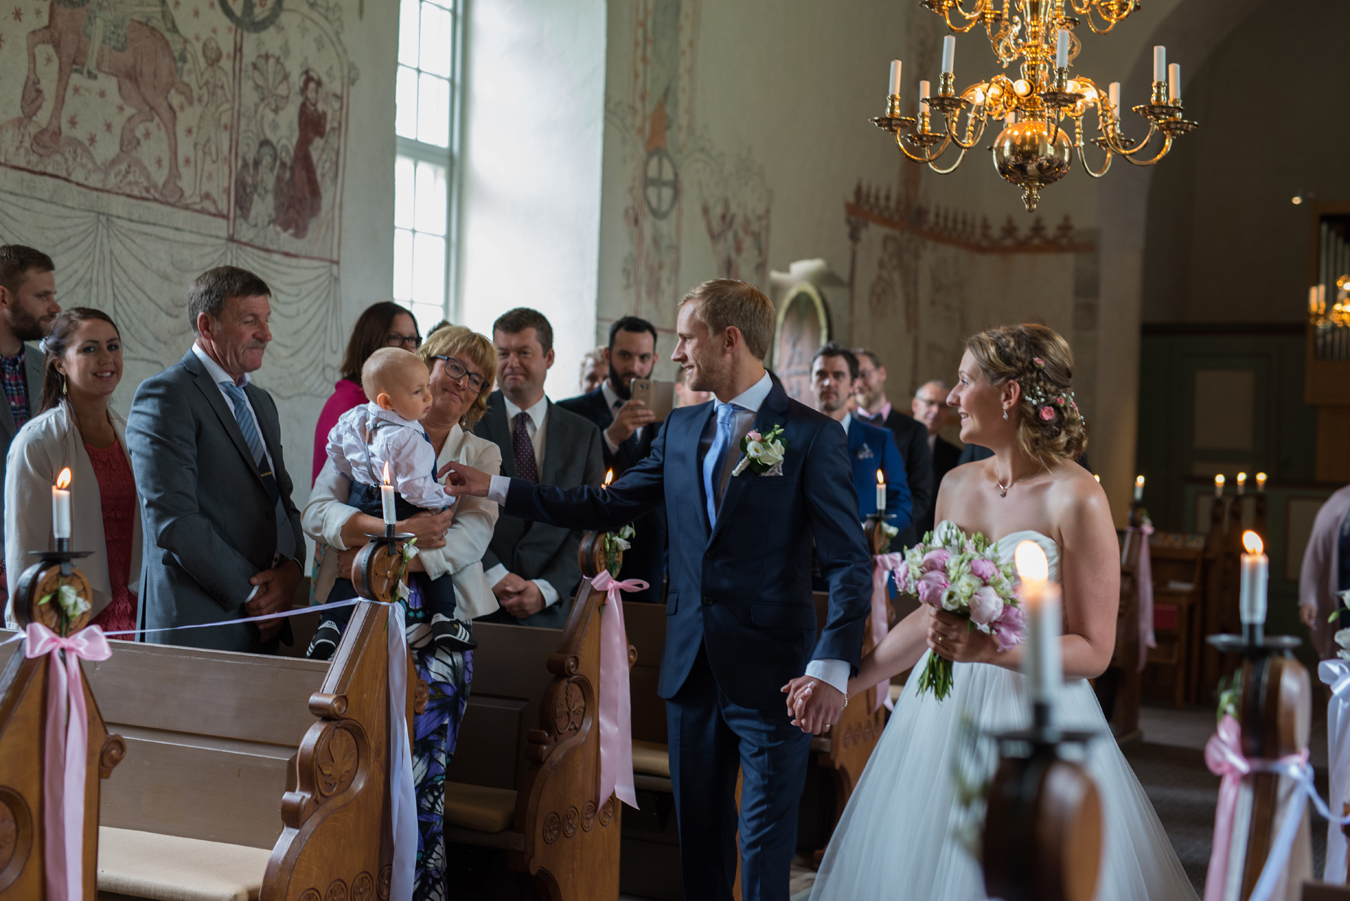 003-bröllopsfotograf-folhammar-gotland-neas-fotografi.jpg